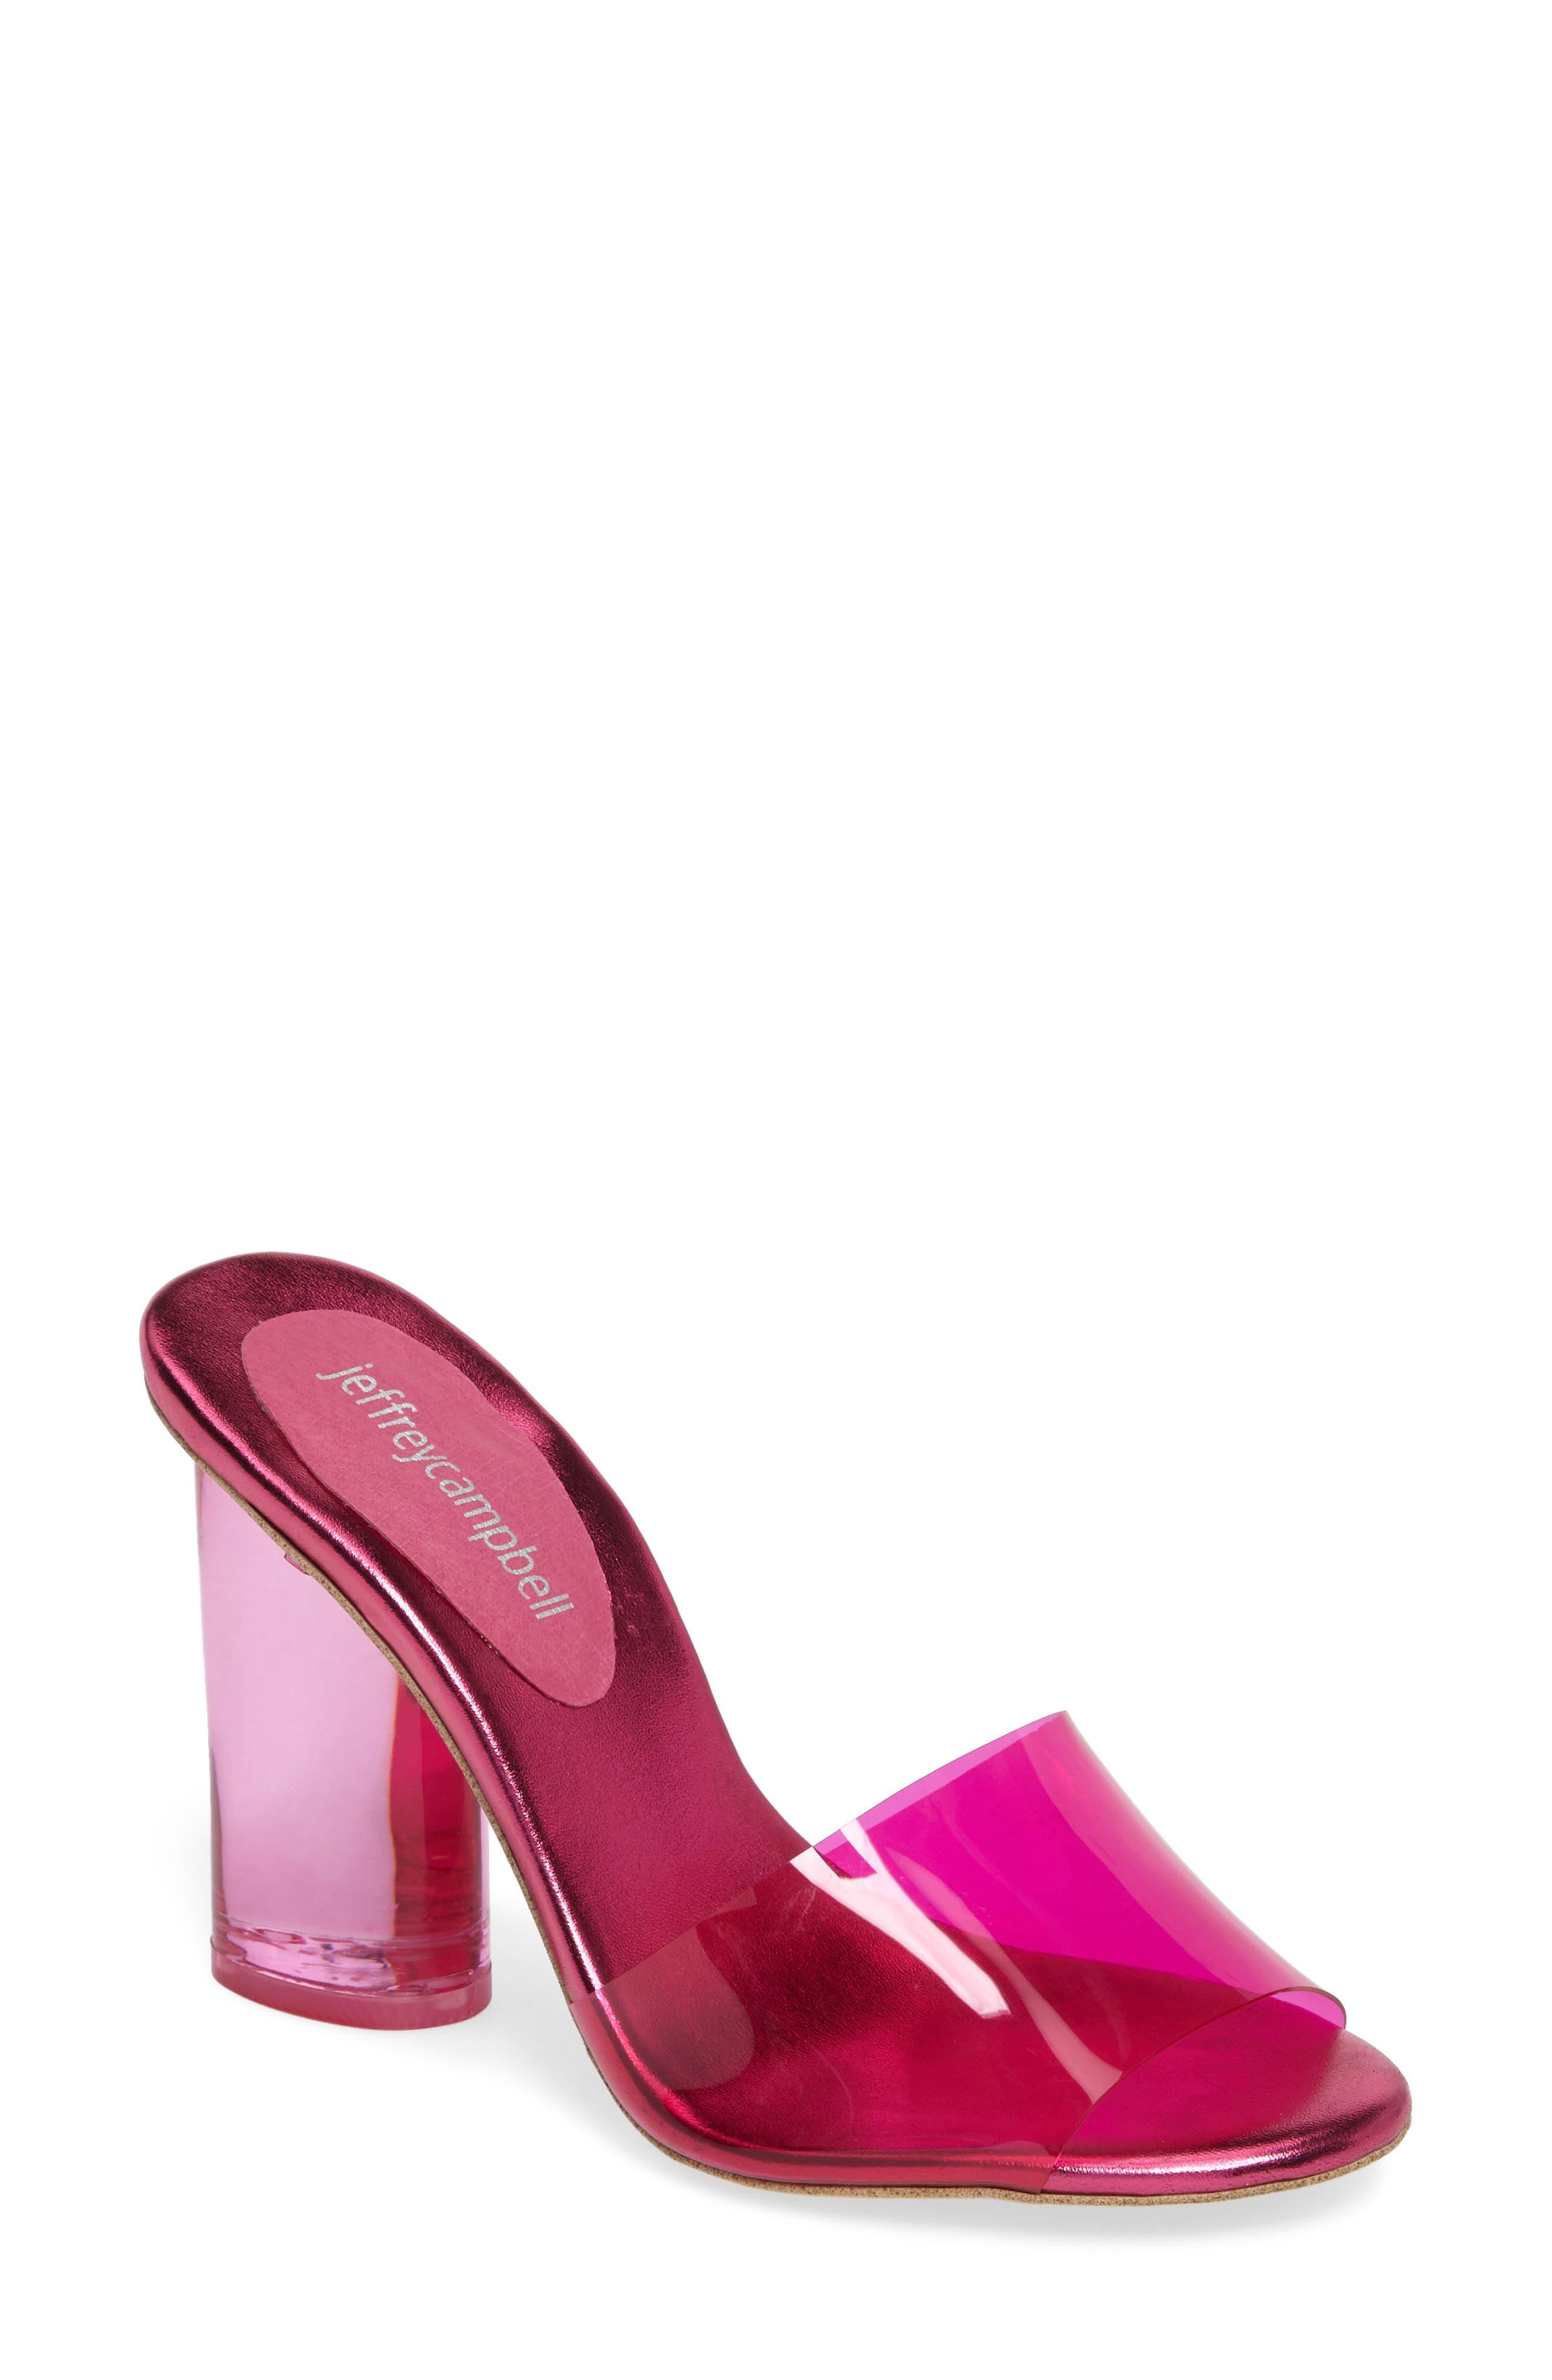 Main Image - Jeffrey Campbell Minuit Slide Sandal (Women)